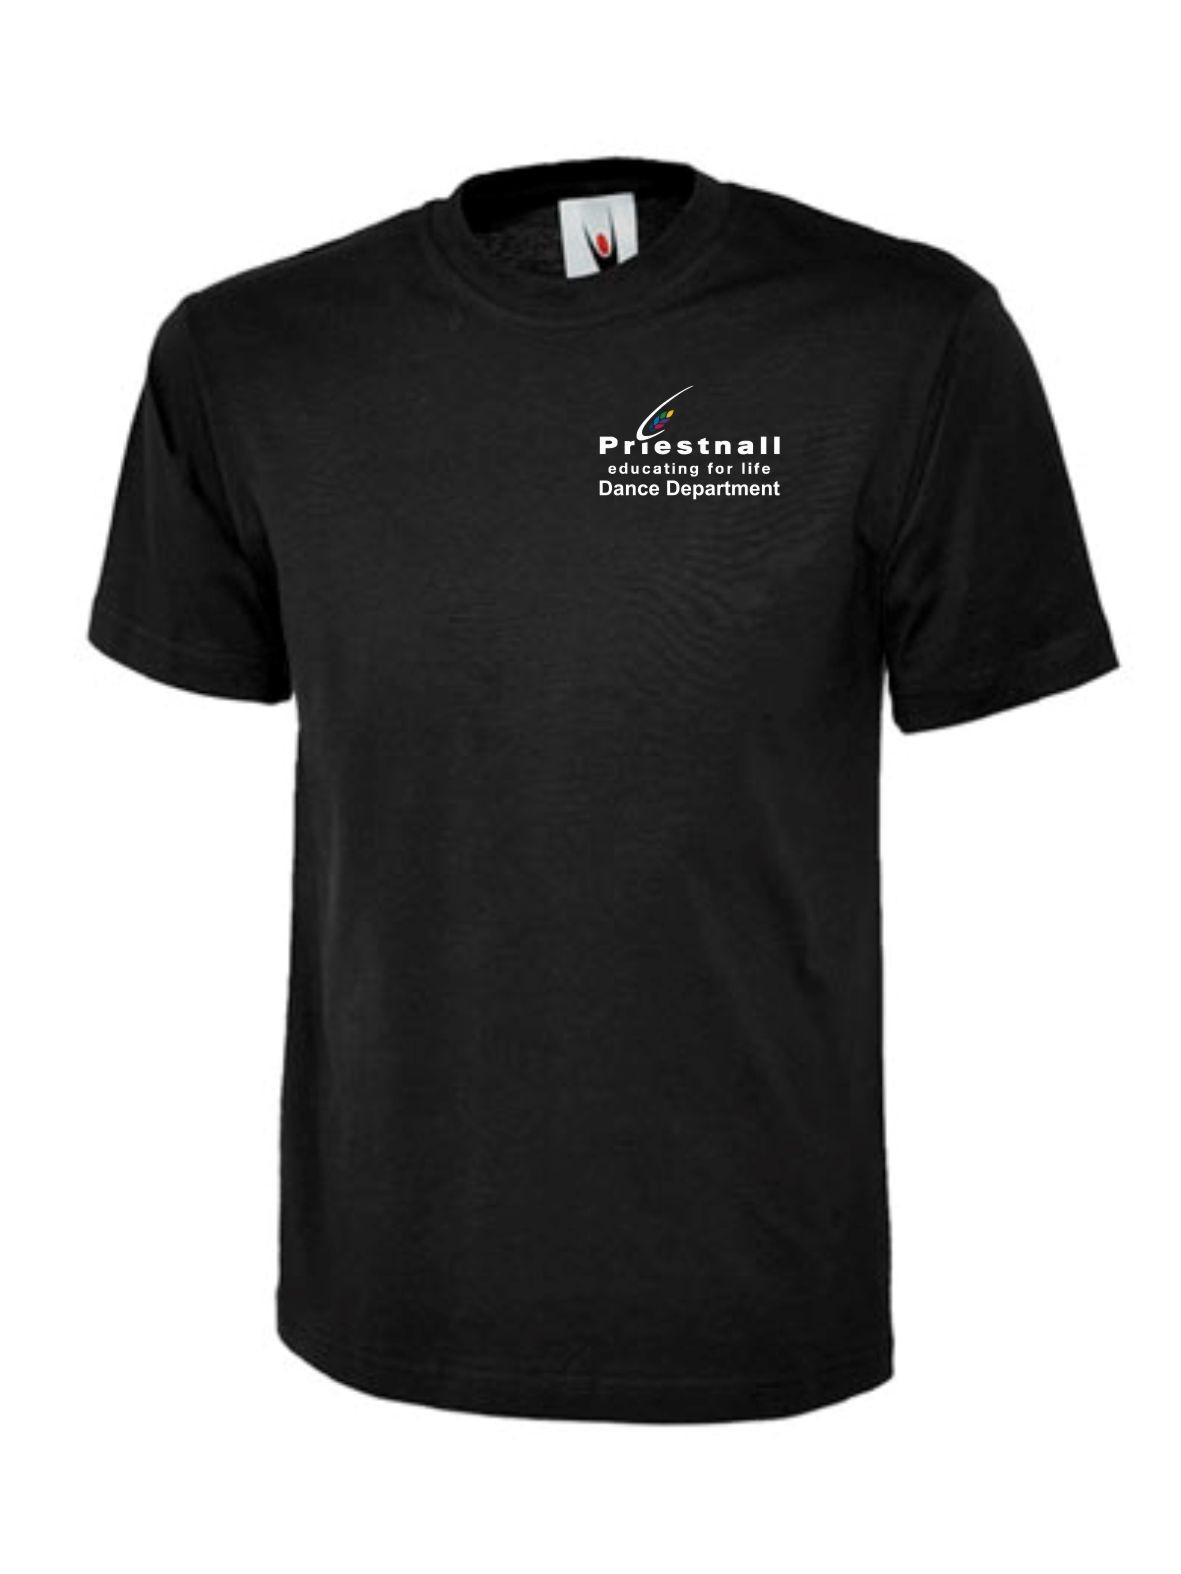 Priestnall T-Shirt